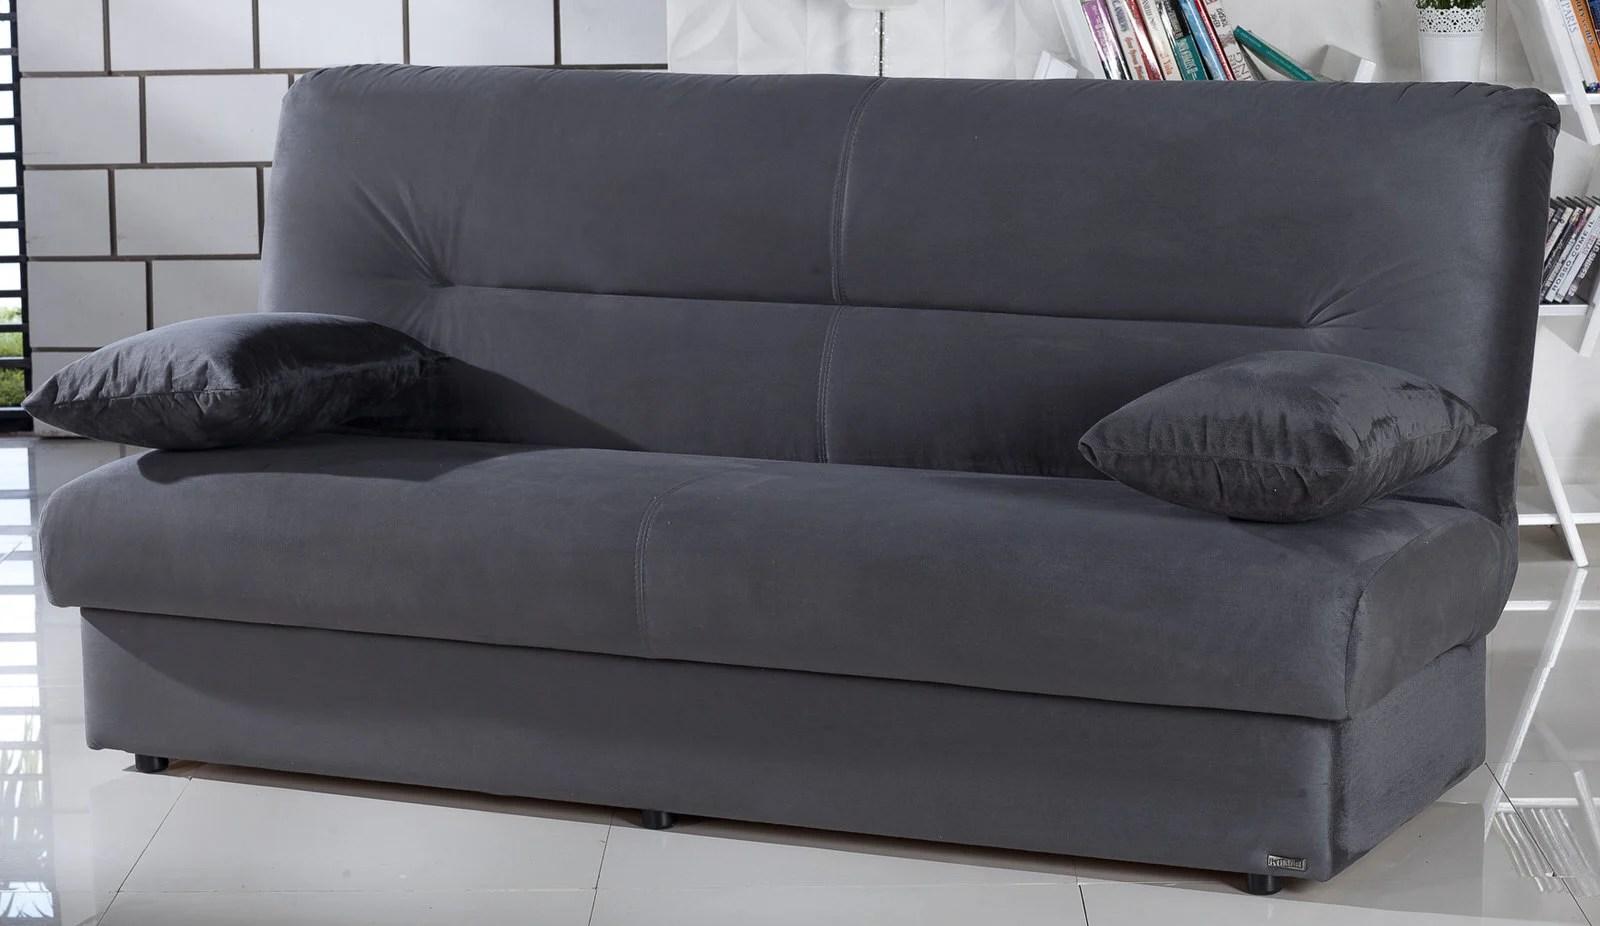 Regata Rainbow Dark Gray Convertible Sofa Bed By Istikbal